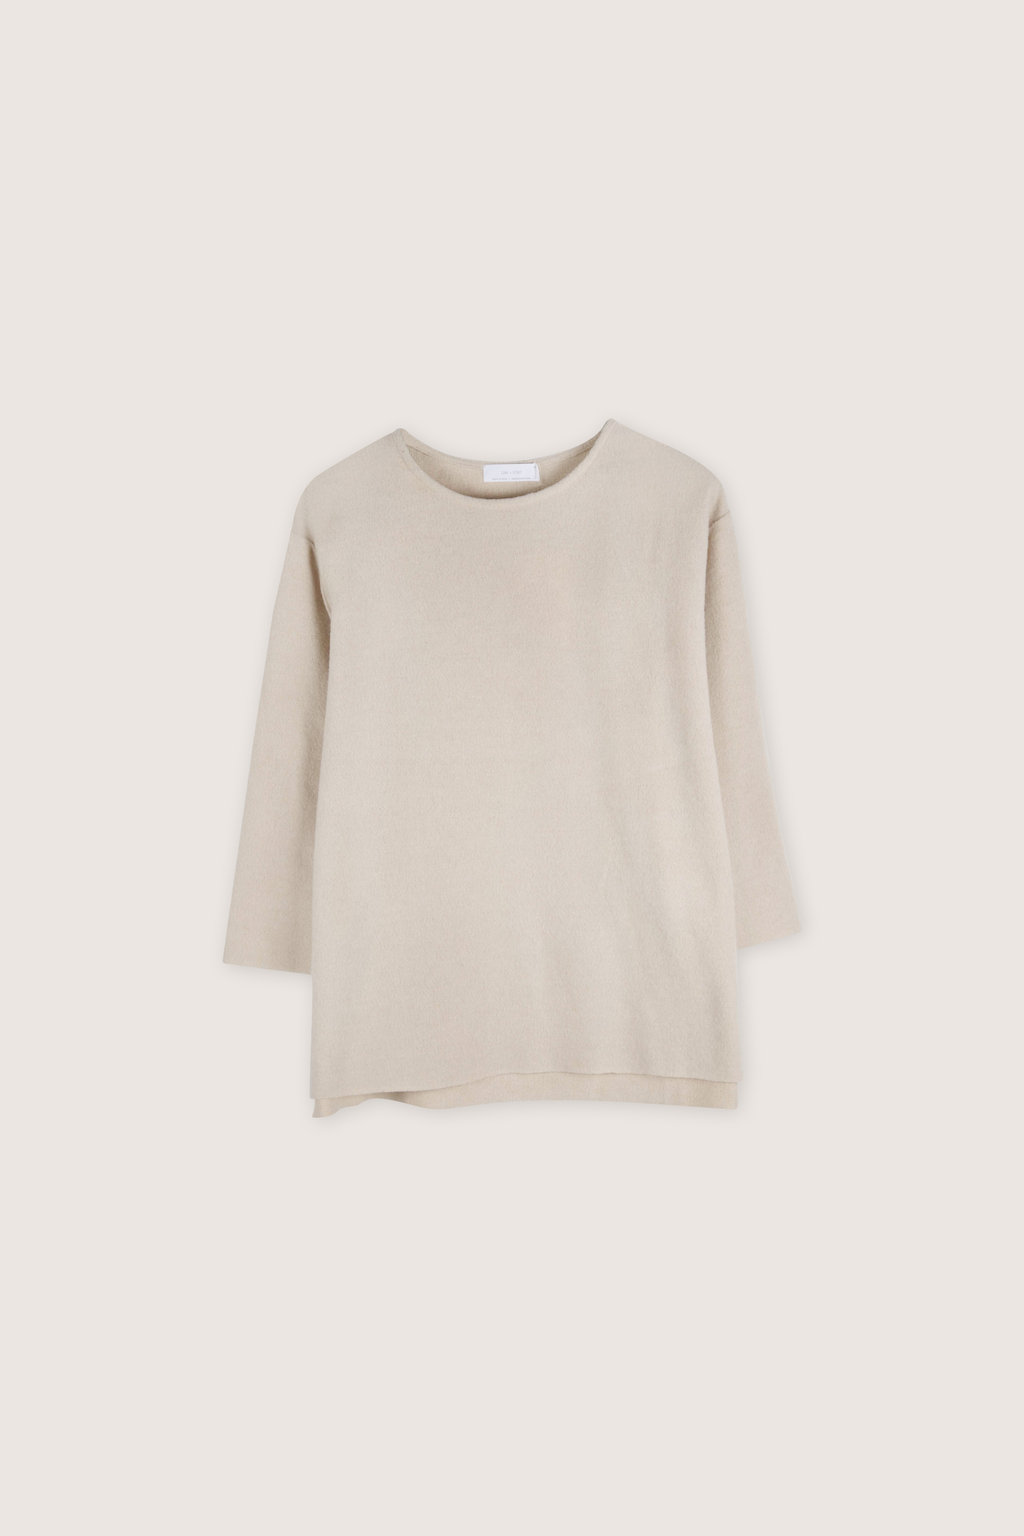 Sweater 1641 Oatmeal 5